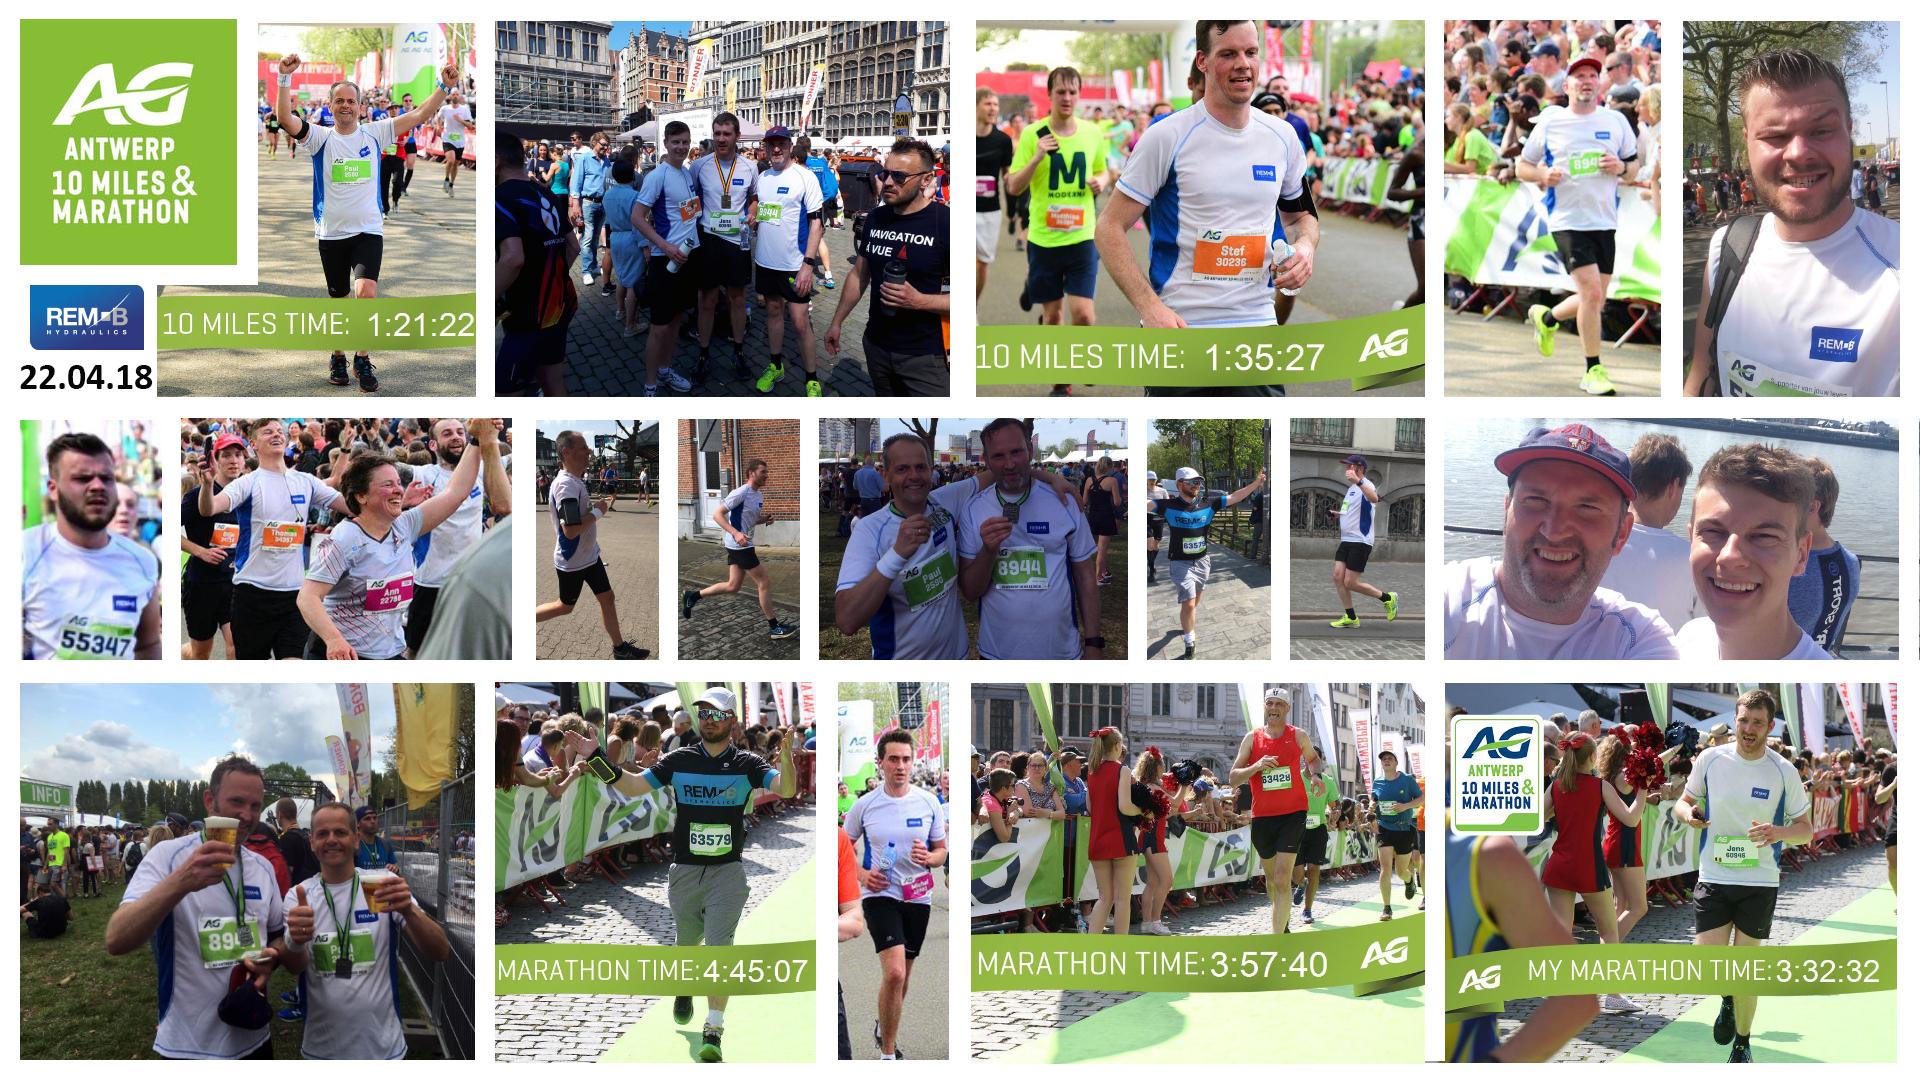 Antwerp 10 miles REMB